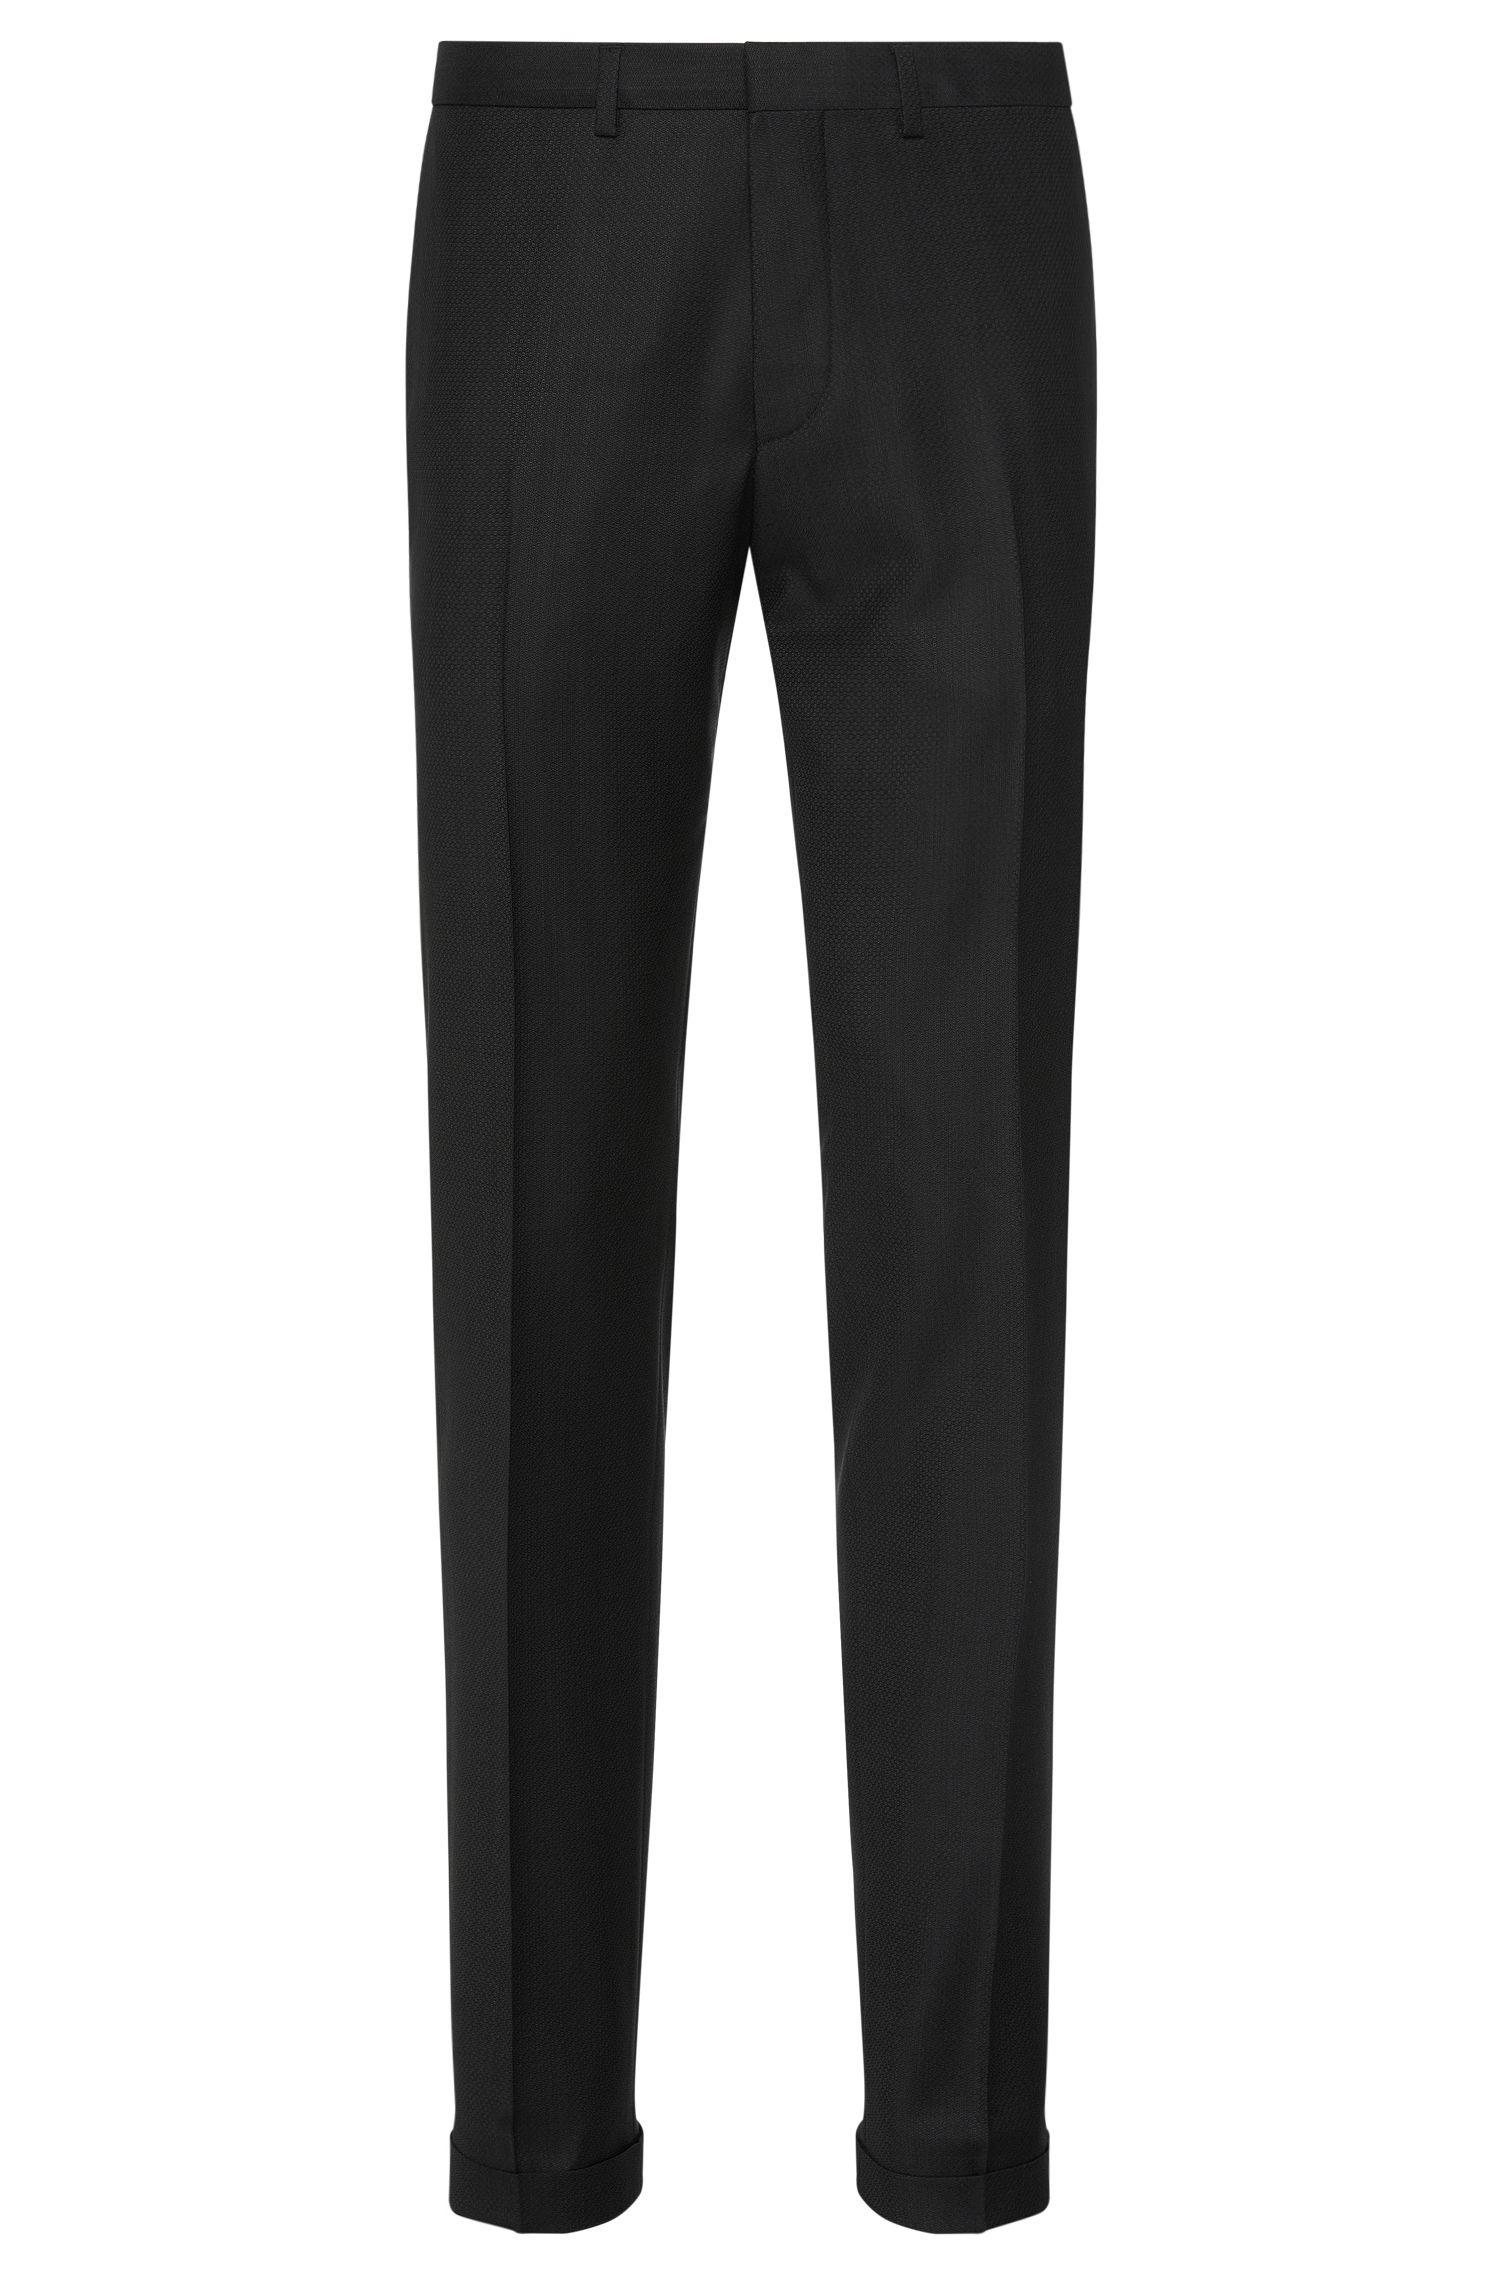 Pantalón extra slim fit en lana virgen con textura fina: 'C-Wyn'